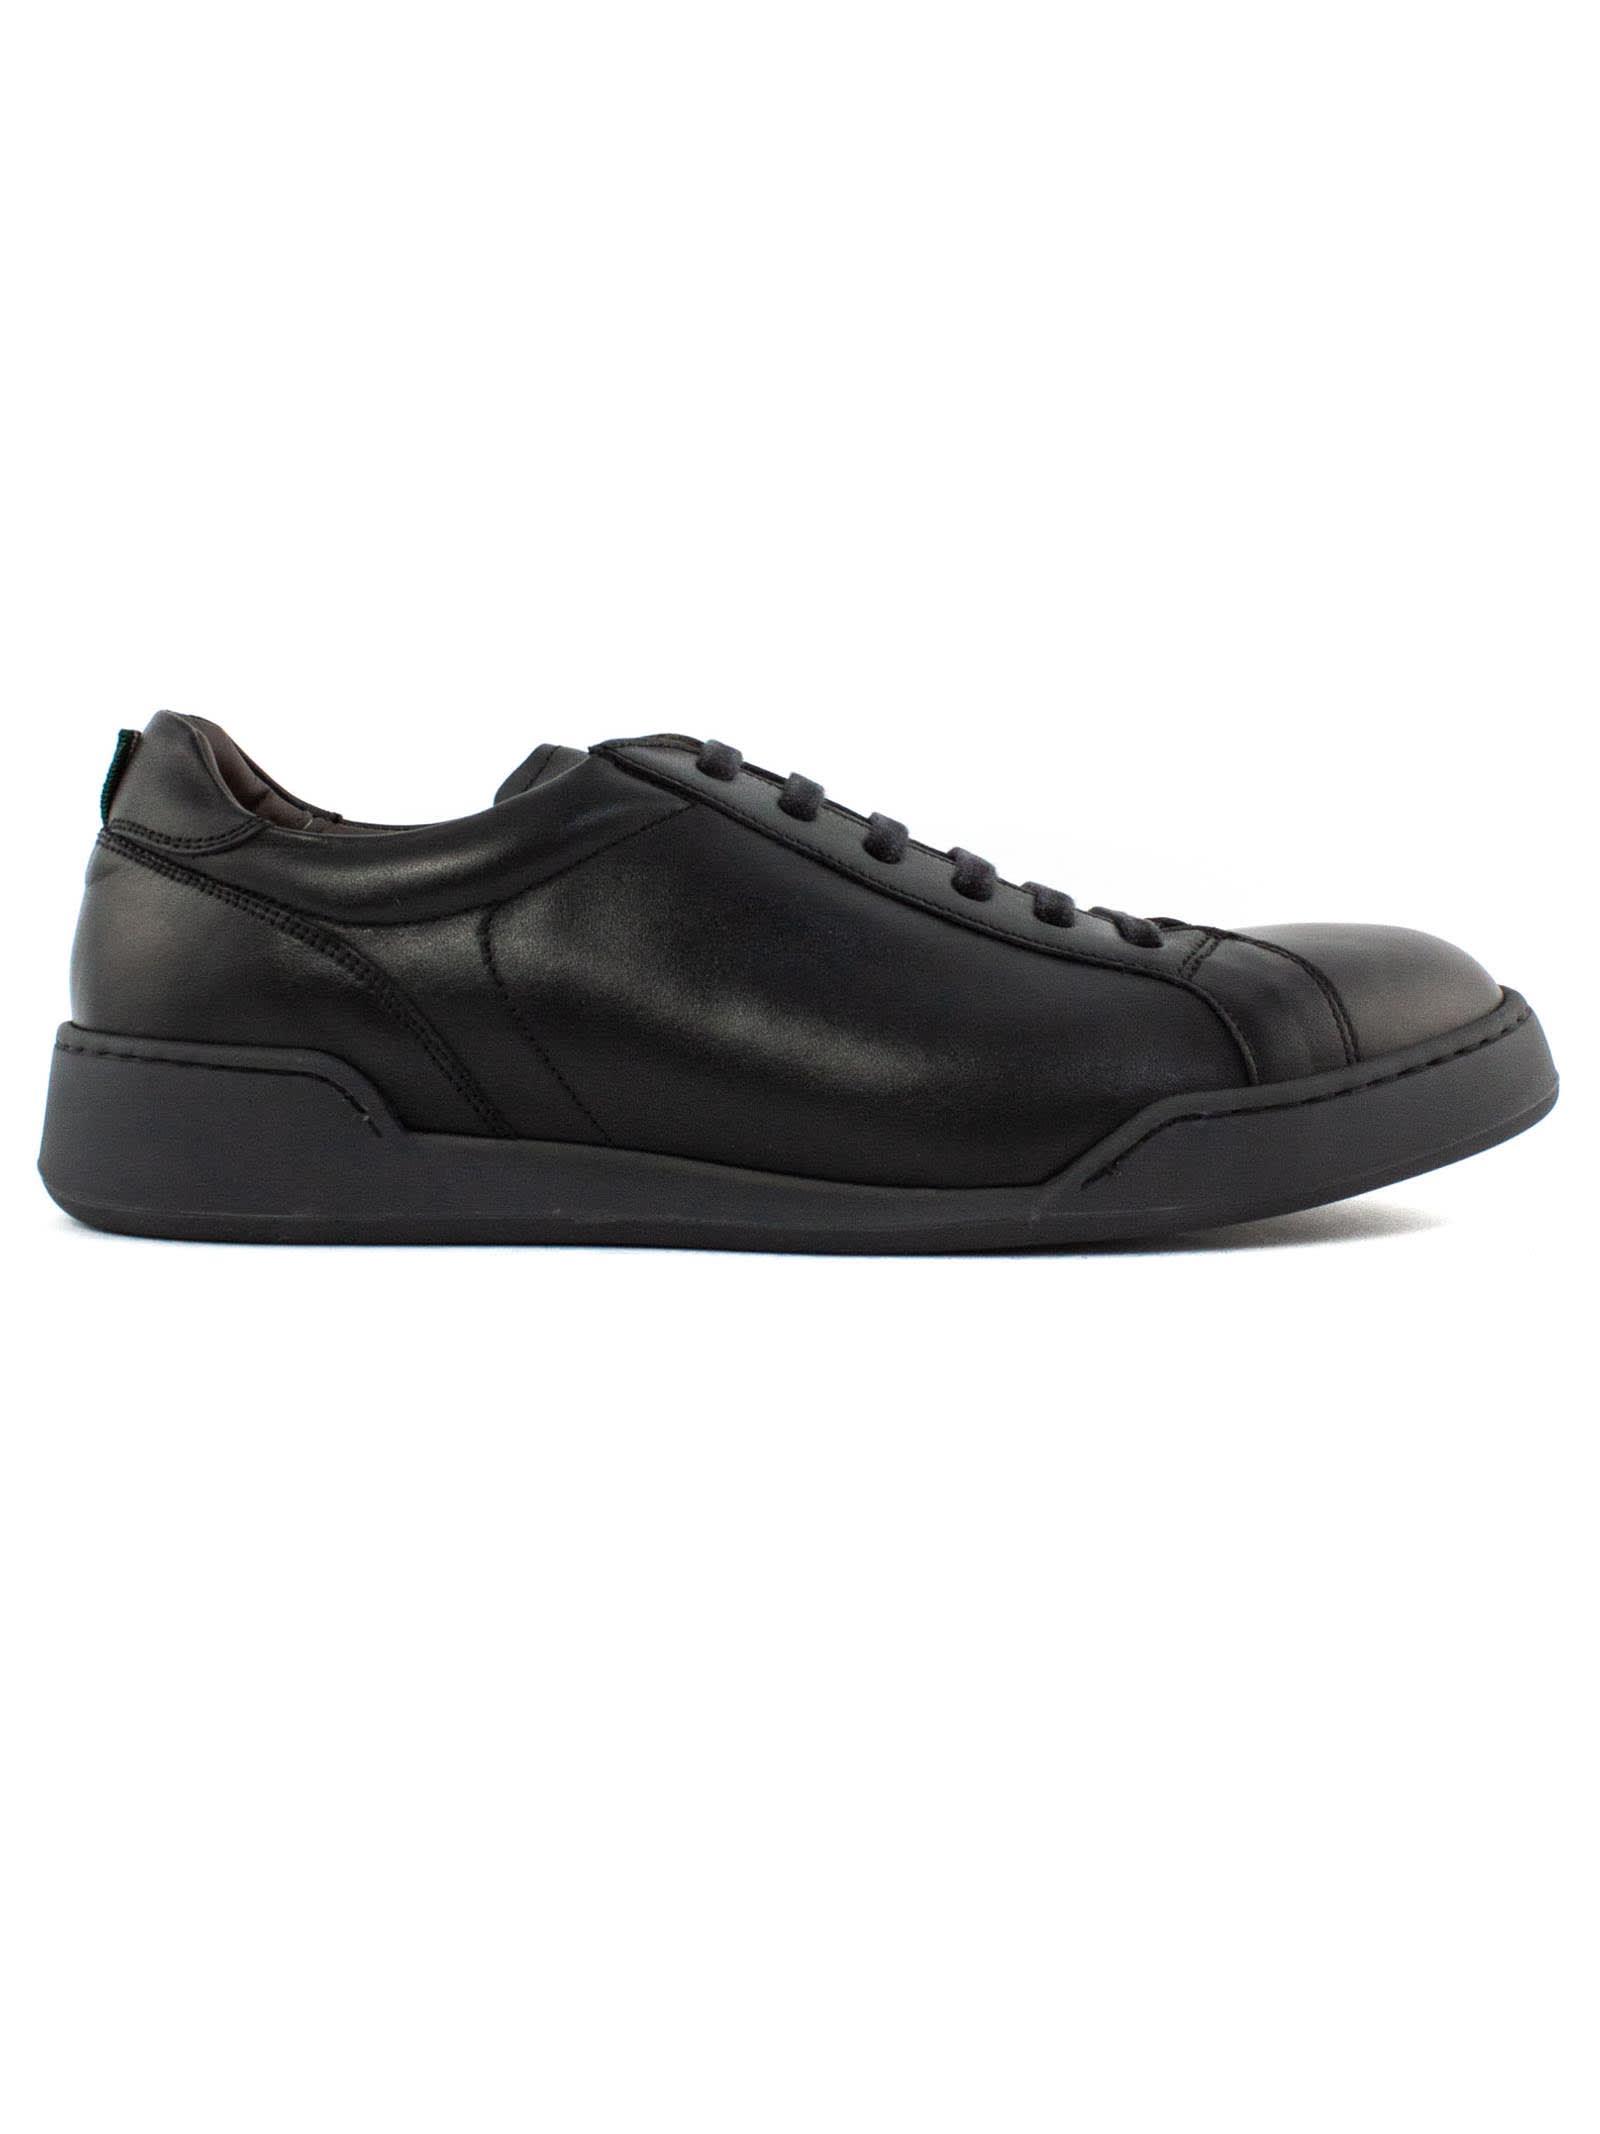 Green George Black Leather Sneakers